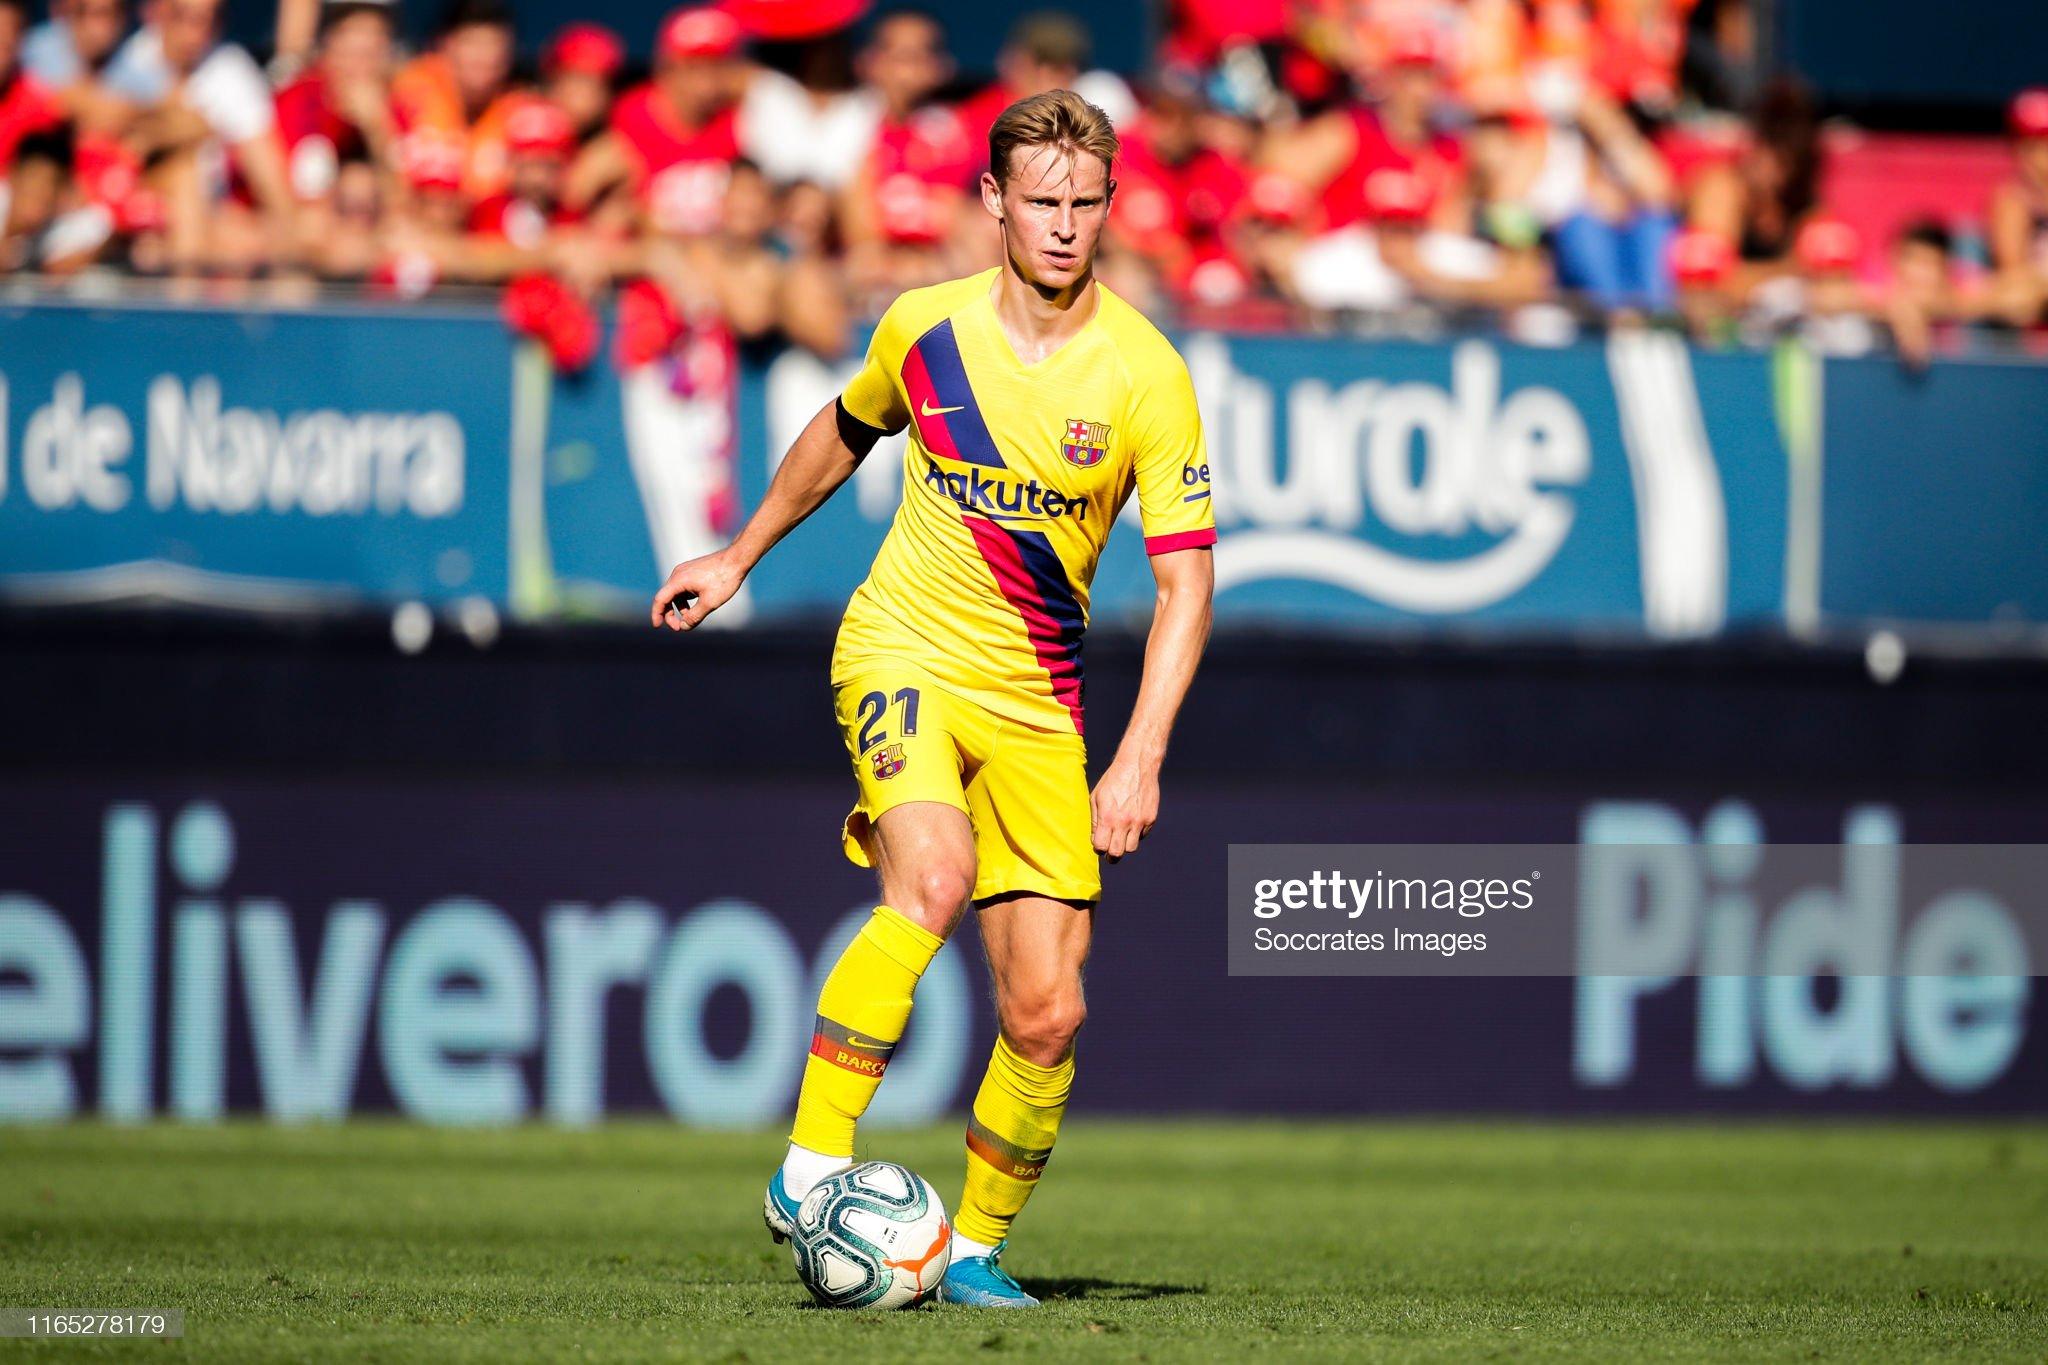 صور مباراة : أوساسونا - برشلونة 2-2 ( 31-08-2019 )  Frenkie-de-jong-of-fc-barcelona-during-the-la-liga-santander-match-picture-id1165278179?s=2048x2048